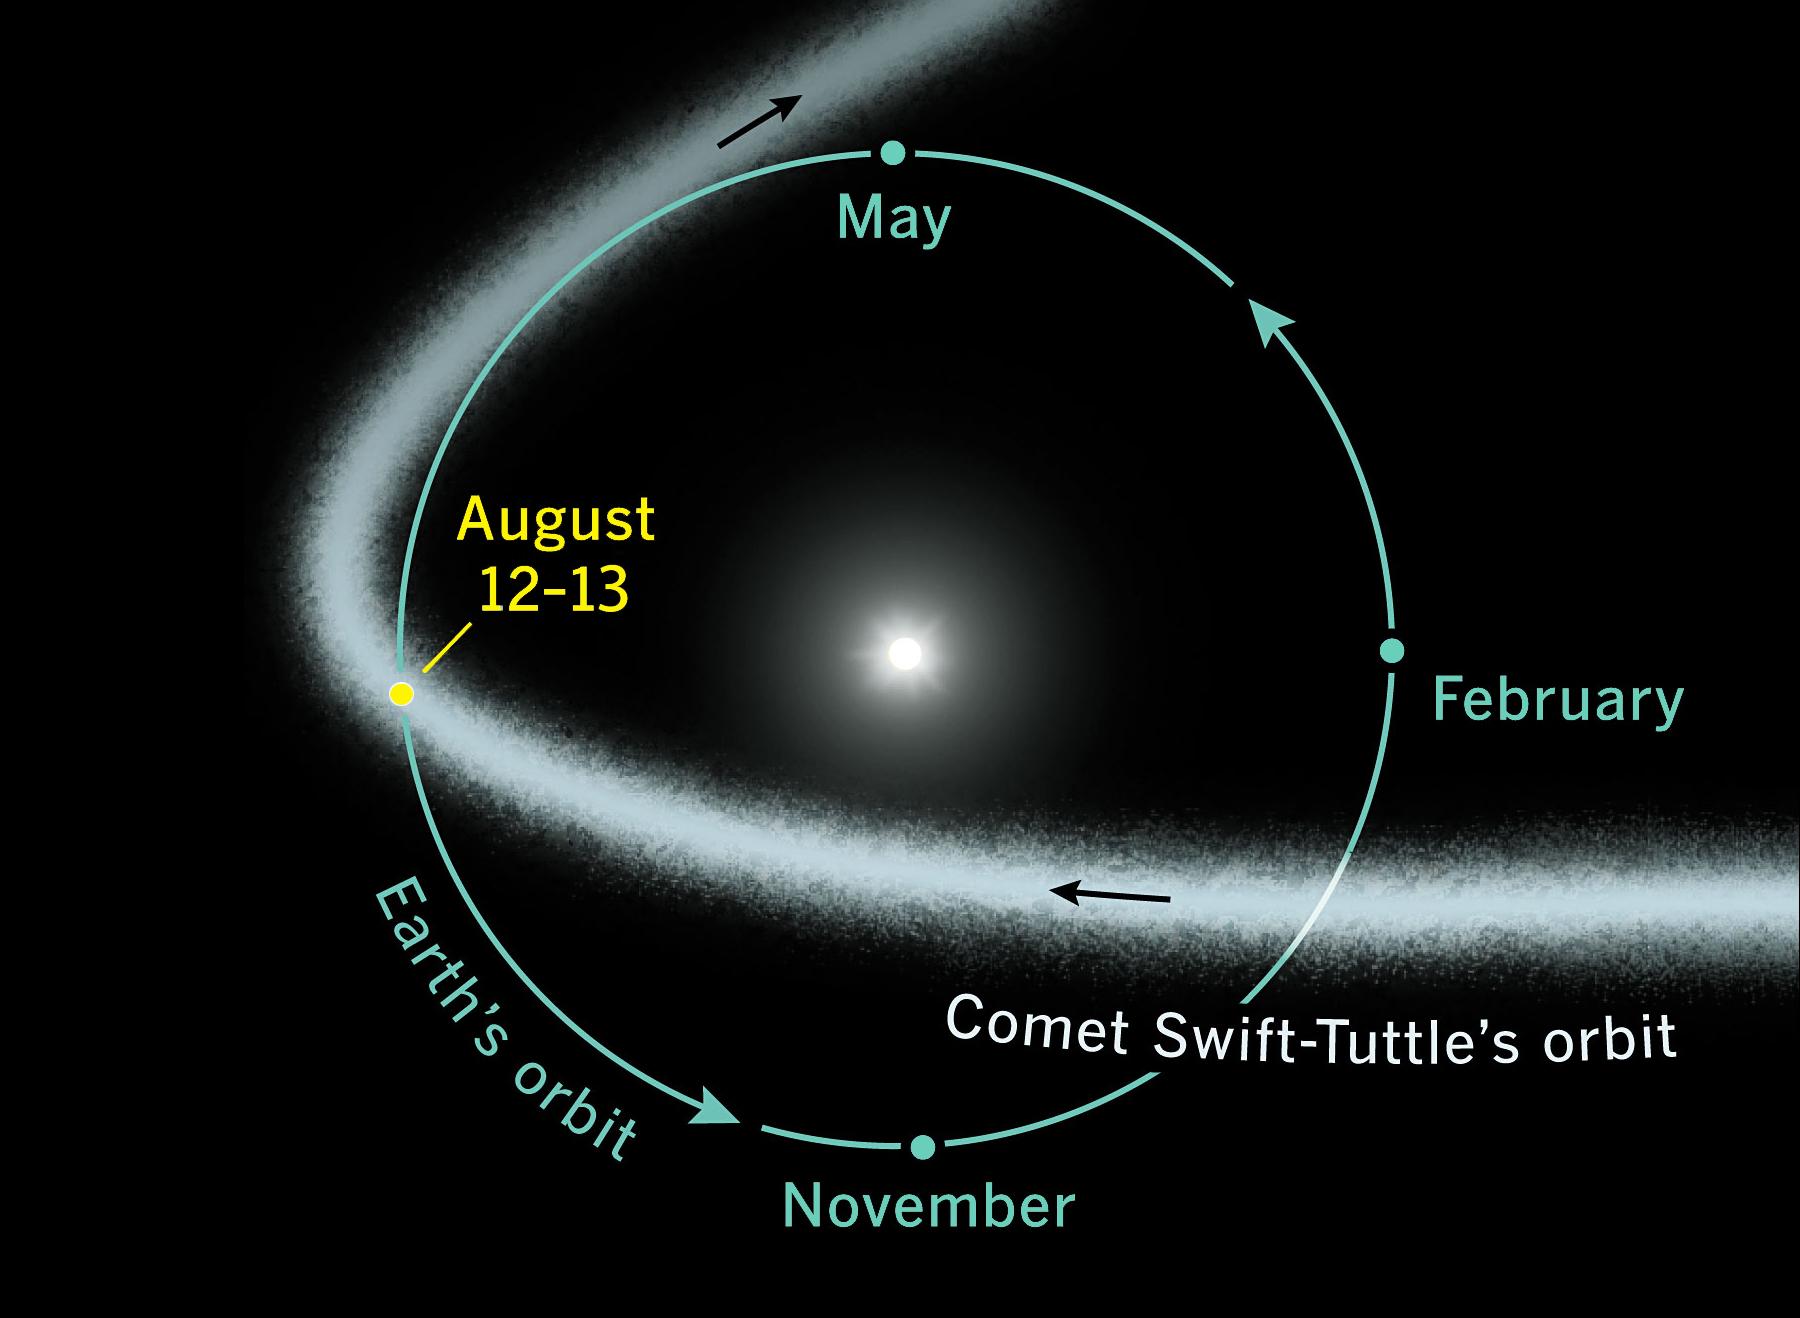 Perseids orbit path Aug 12-13